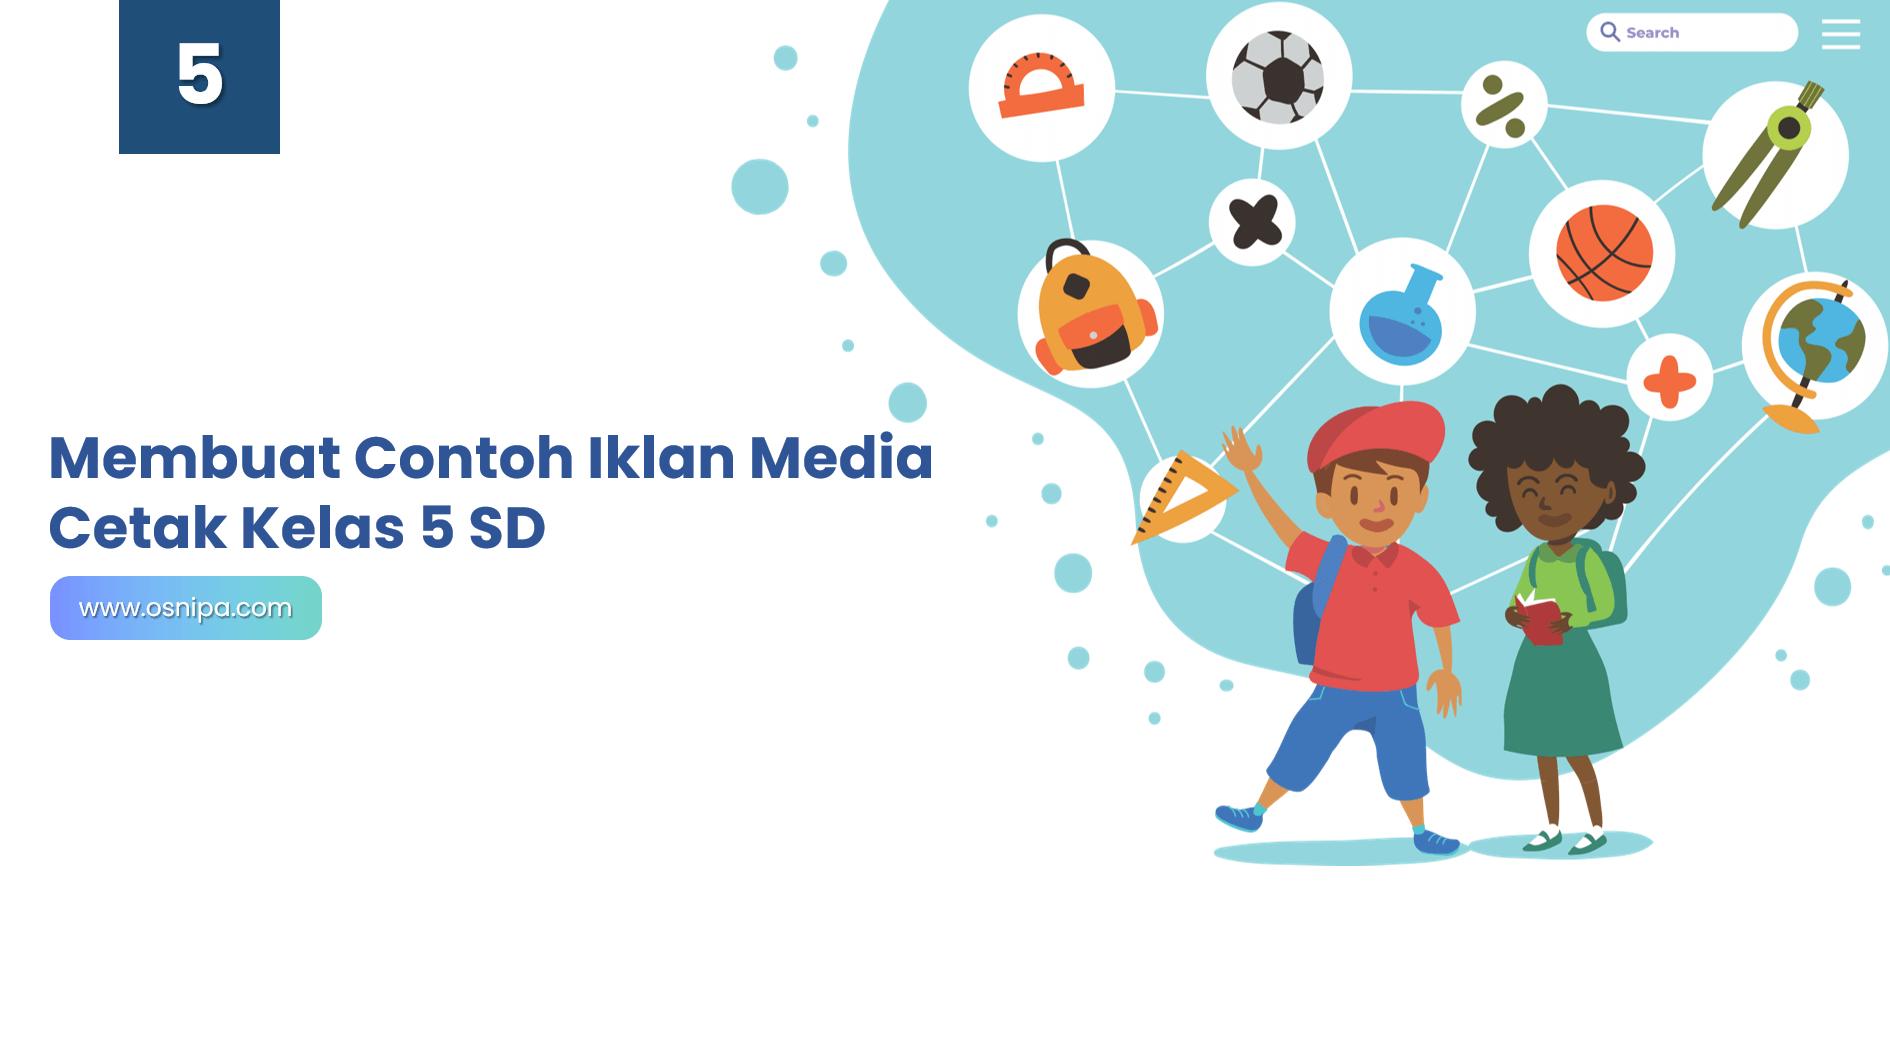 Membuat Contoh Iklan Media Cetak Kelas 5 SD